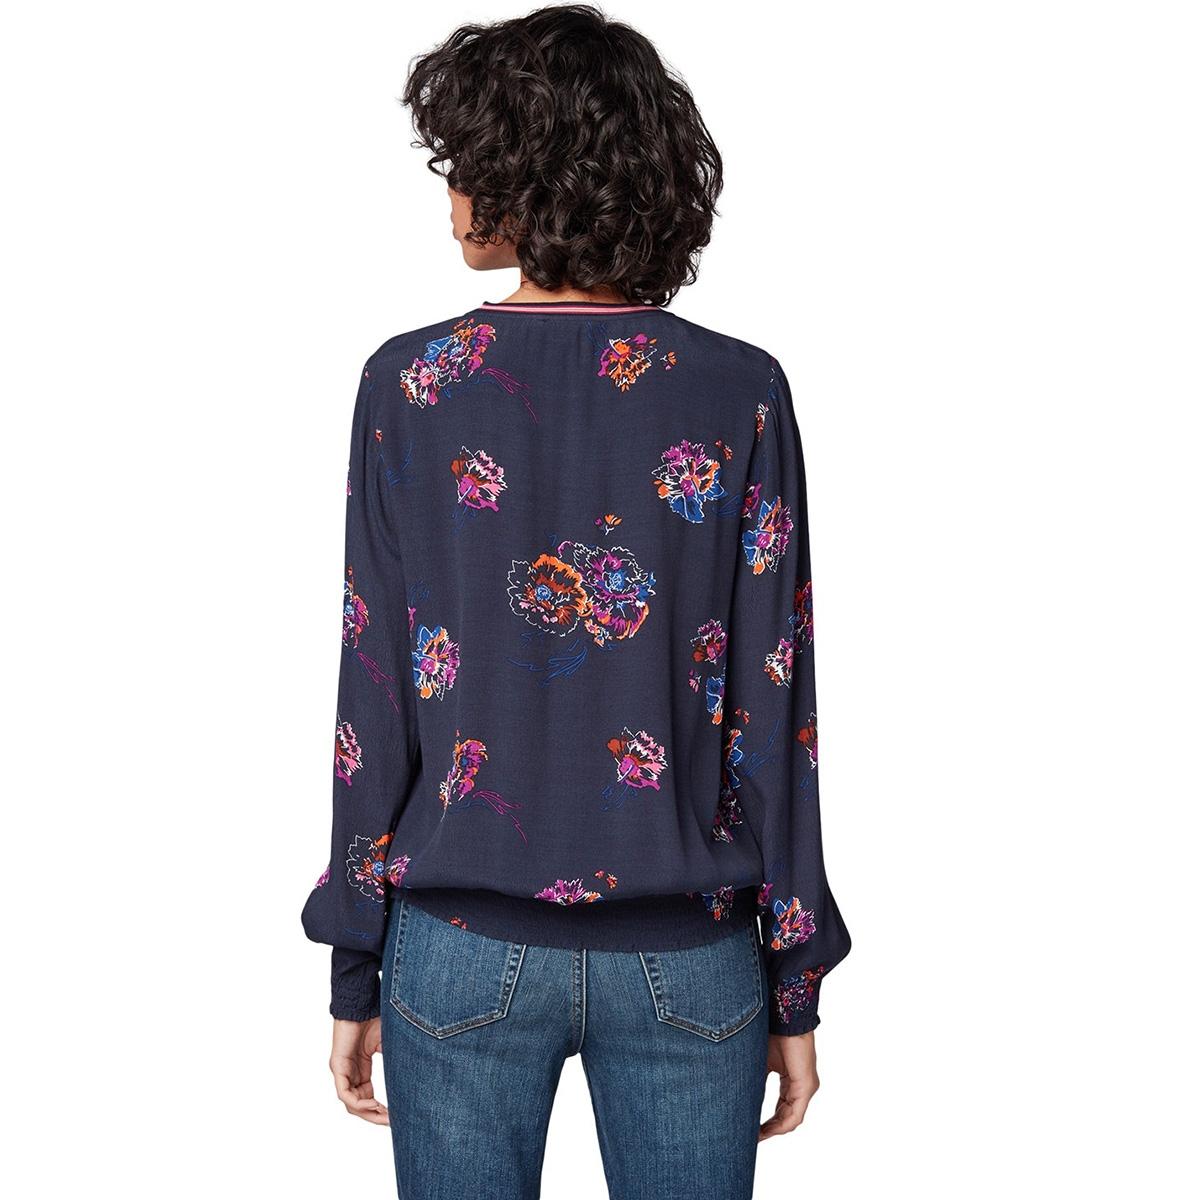 blouse shirt met bloemenpatroon 1014682xx71 tom tailor blouse 20671